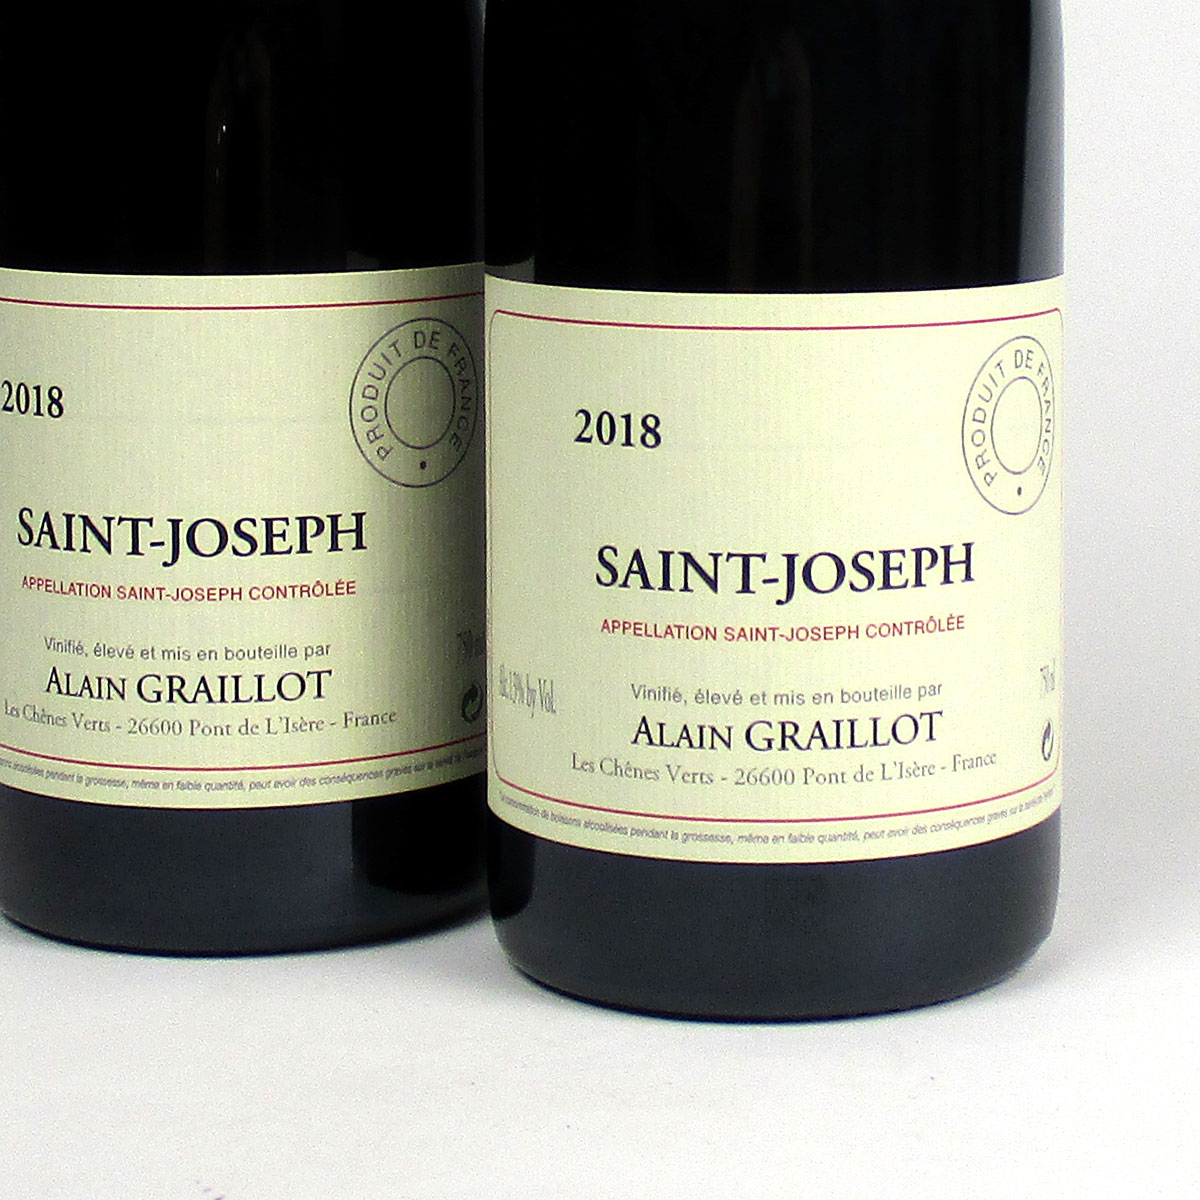 Saint-Joseph: Alain Graillot Rouge 2018